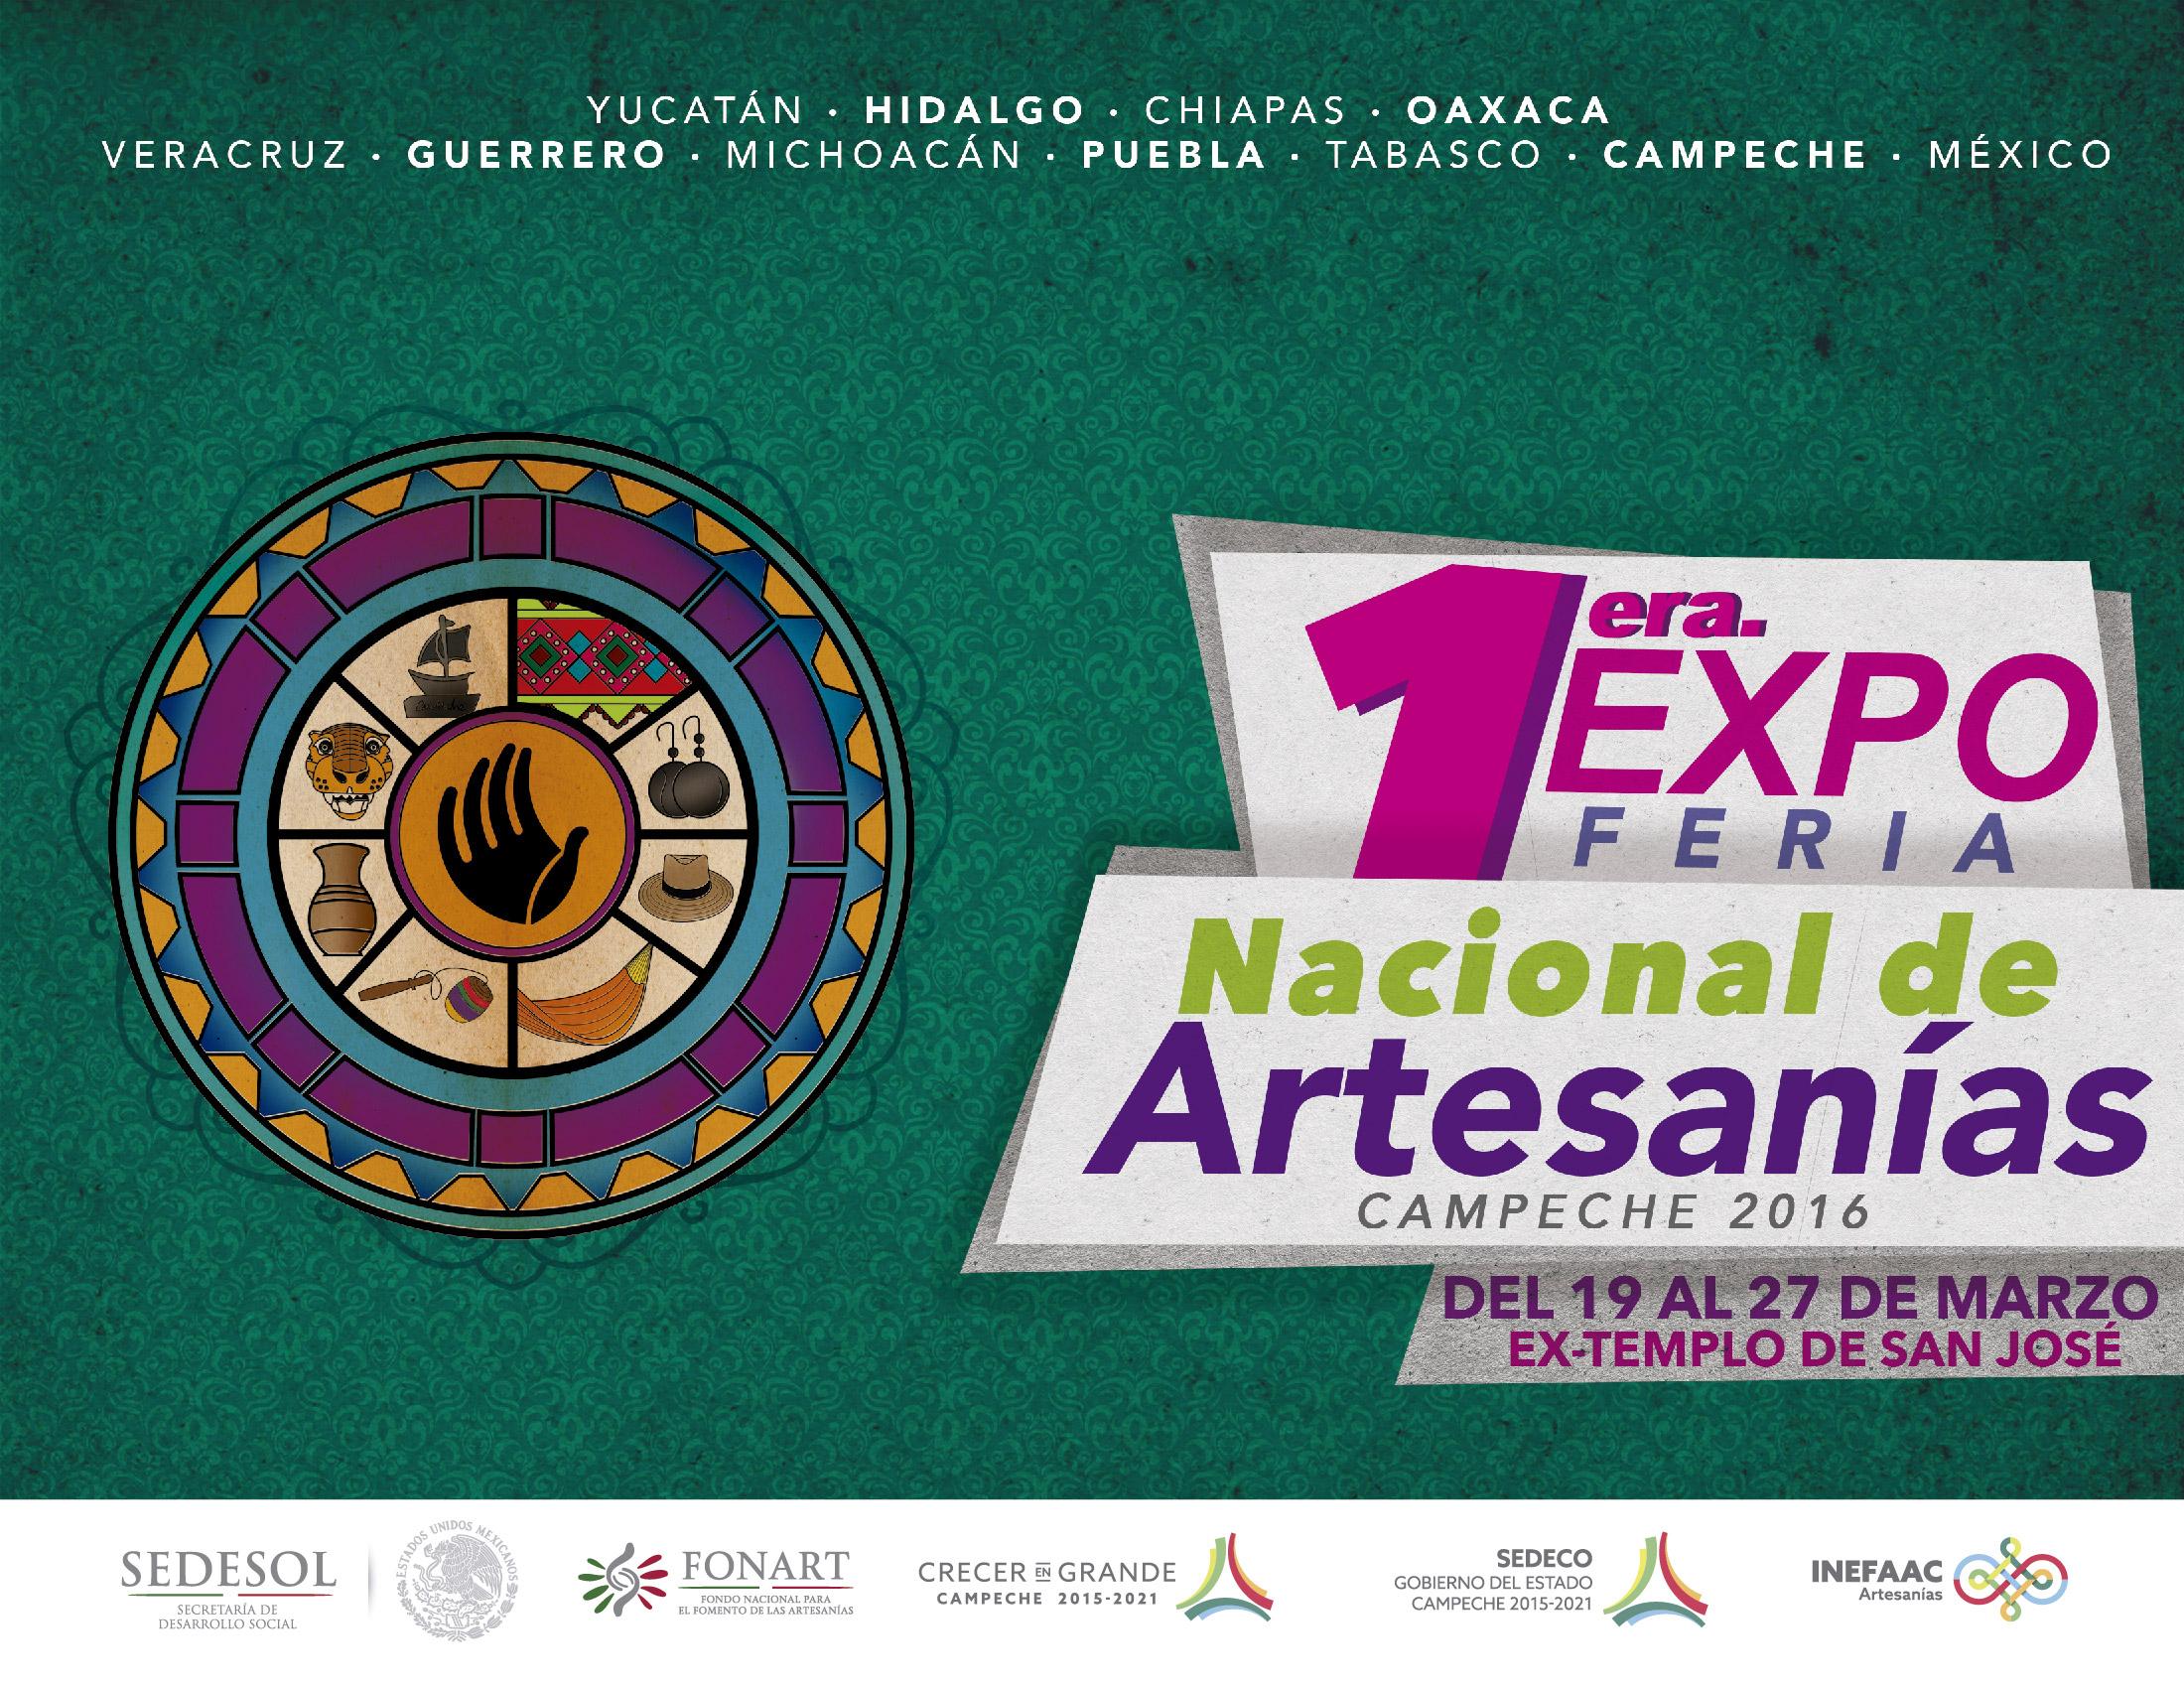 Nete a la celebraci n por el d adelartesano fondo for Feria de artesanias 2016